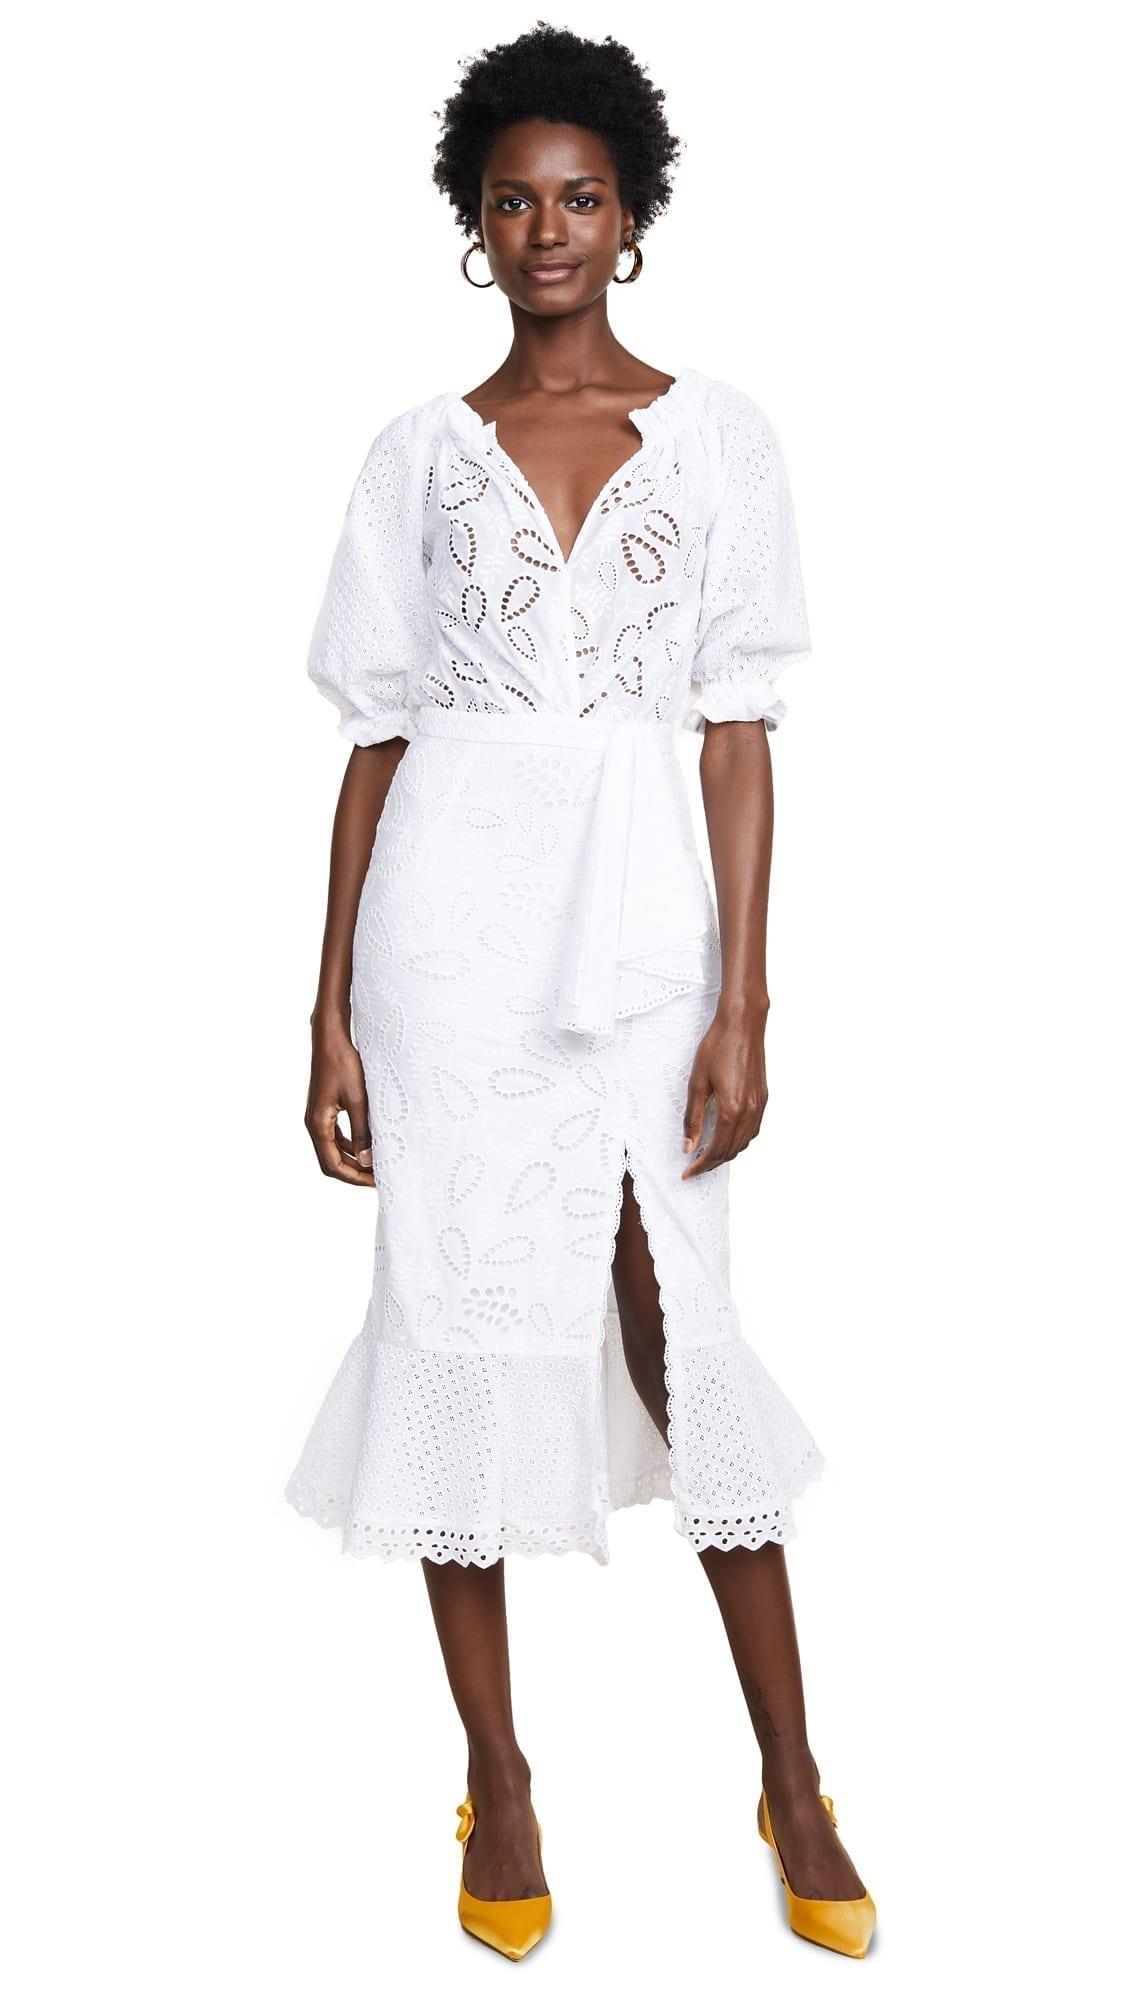 SALONI Olivia French Lace White Dress